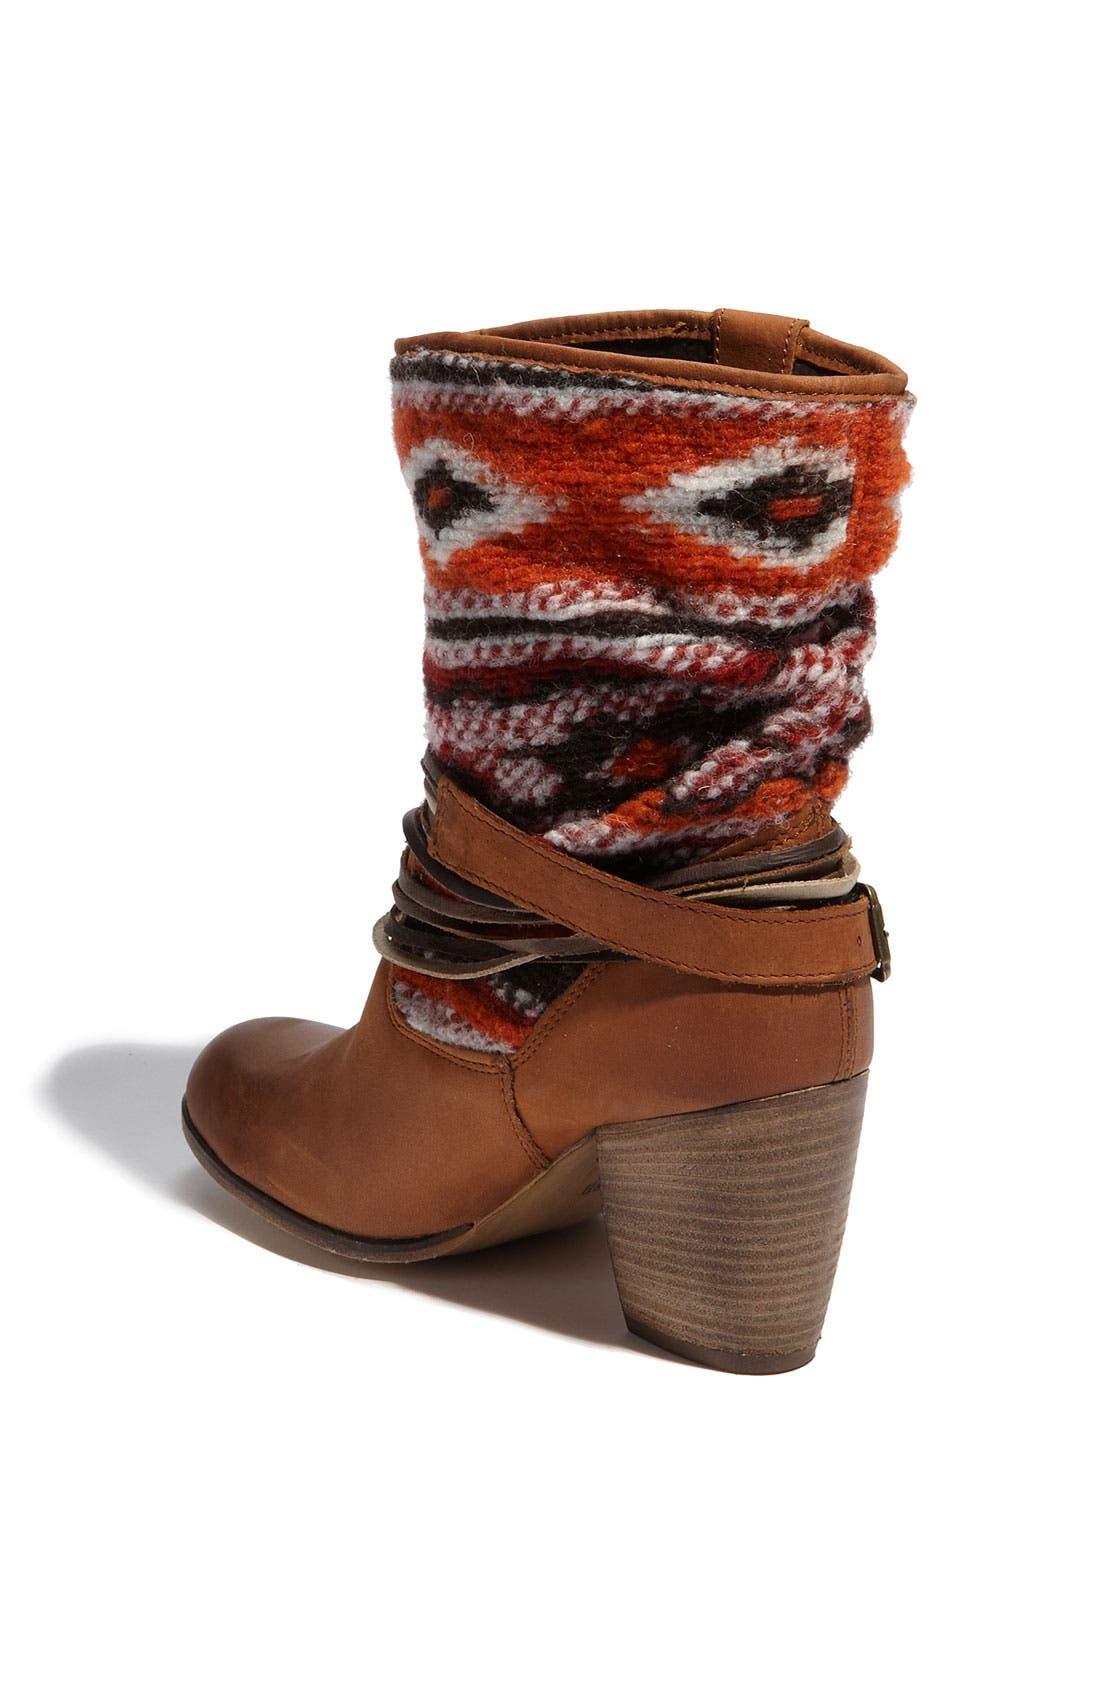 'Tolteca' Boot,                             Alternate thumbnail 2, color,                             Cognac Leather